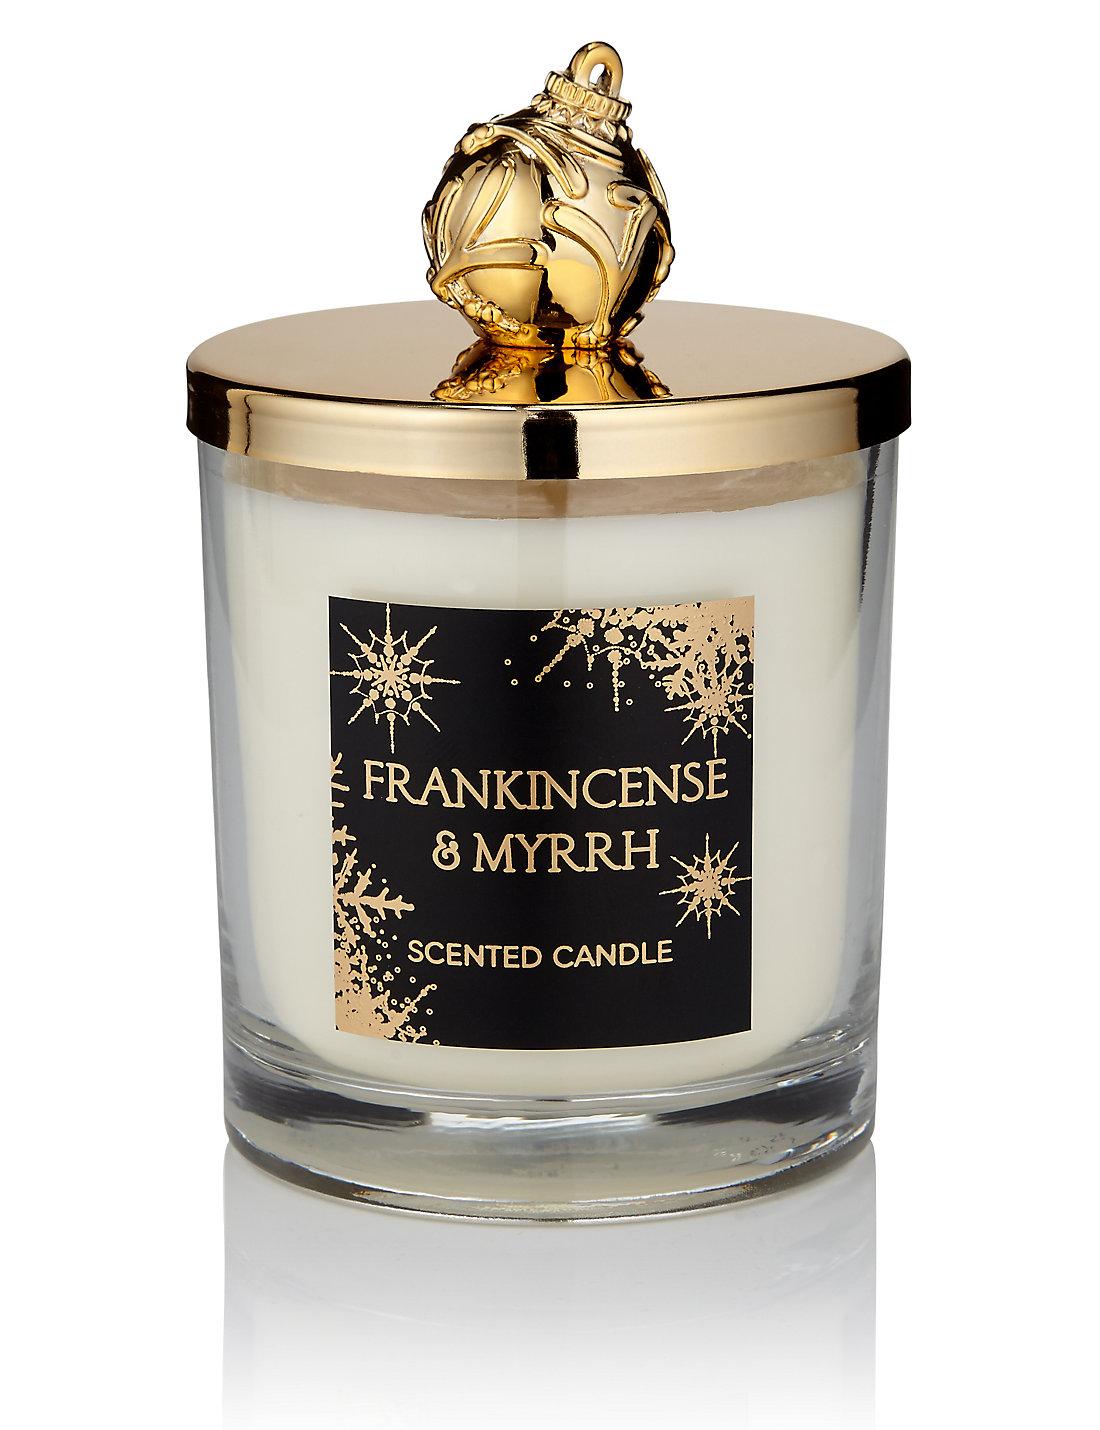 Frankincense & Myrrh Lidded Scented Filled Candle   M&S